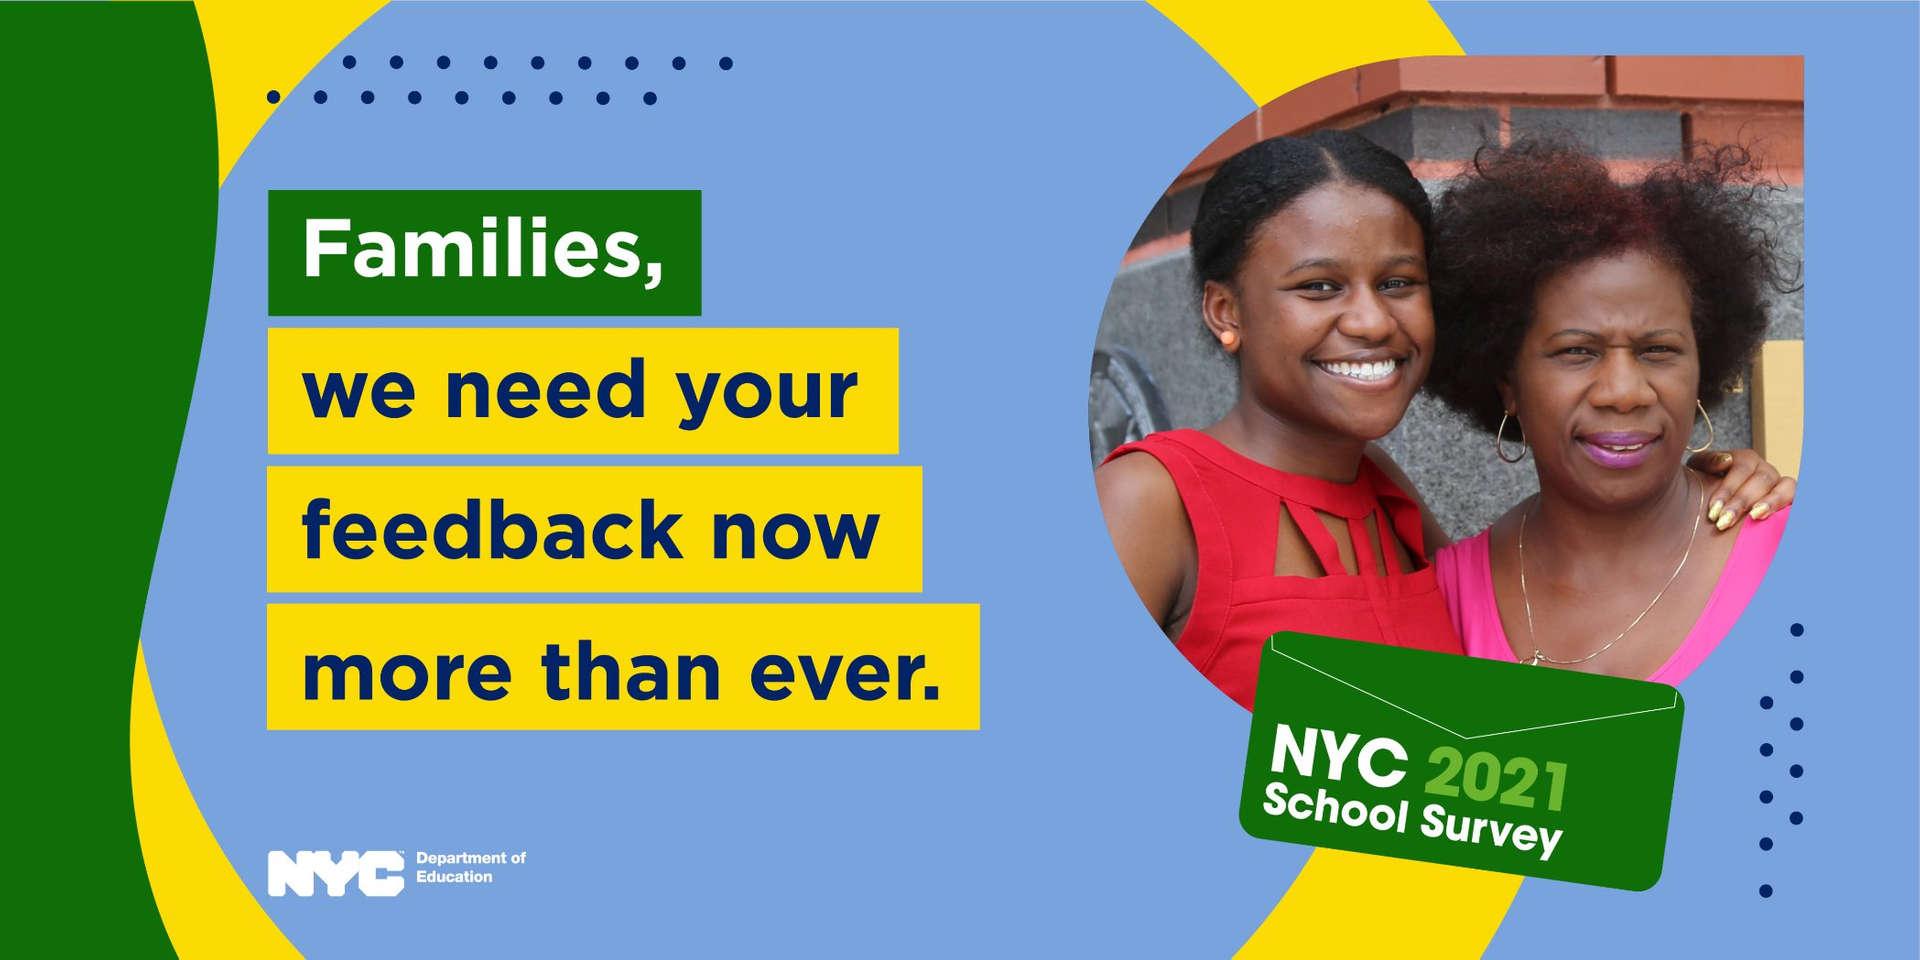 NYC School Survey Poster